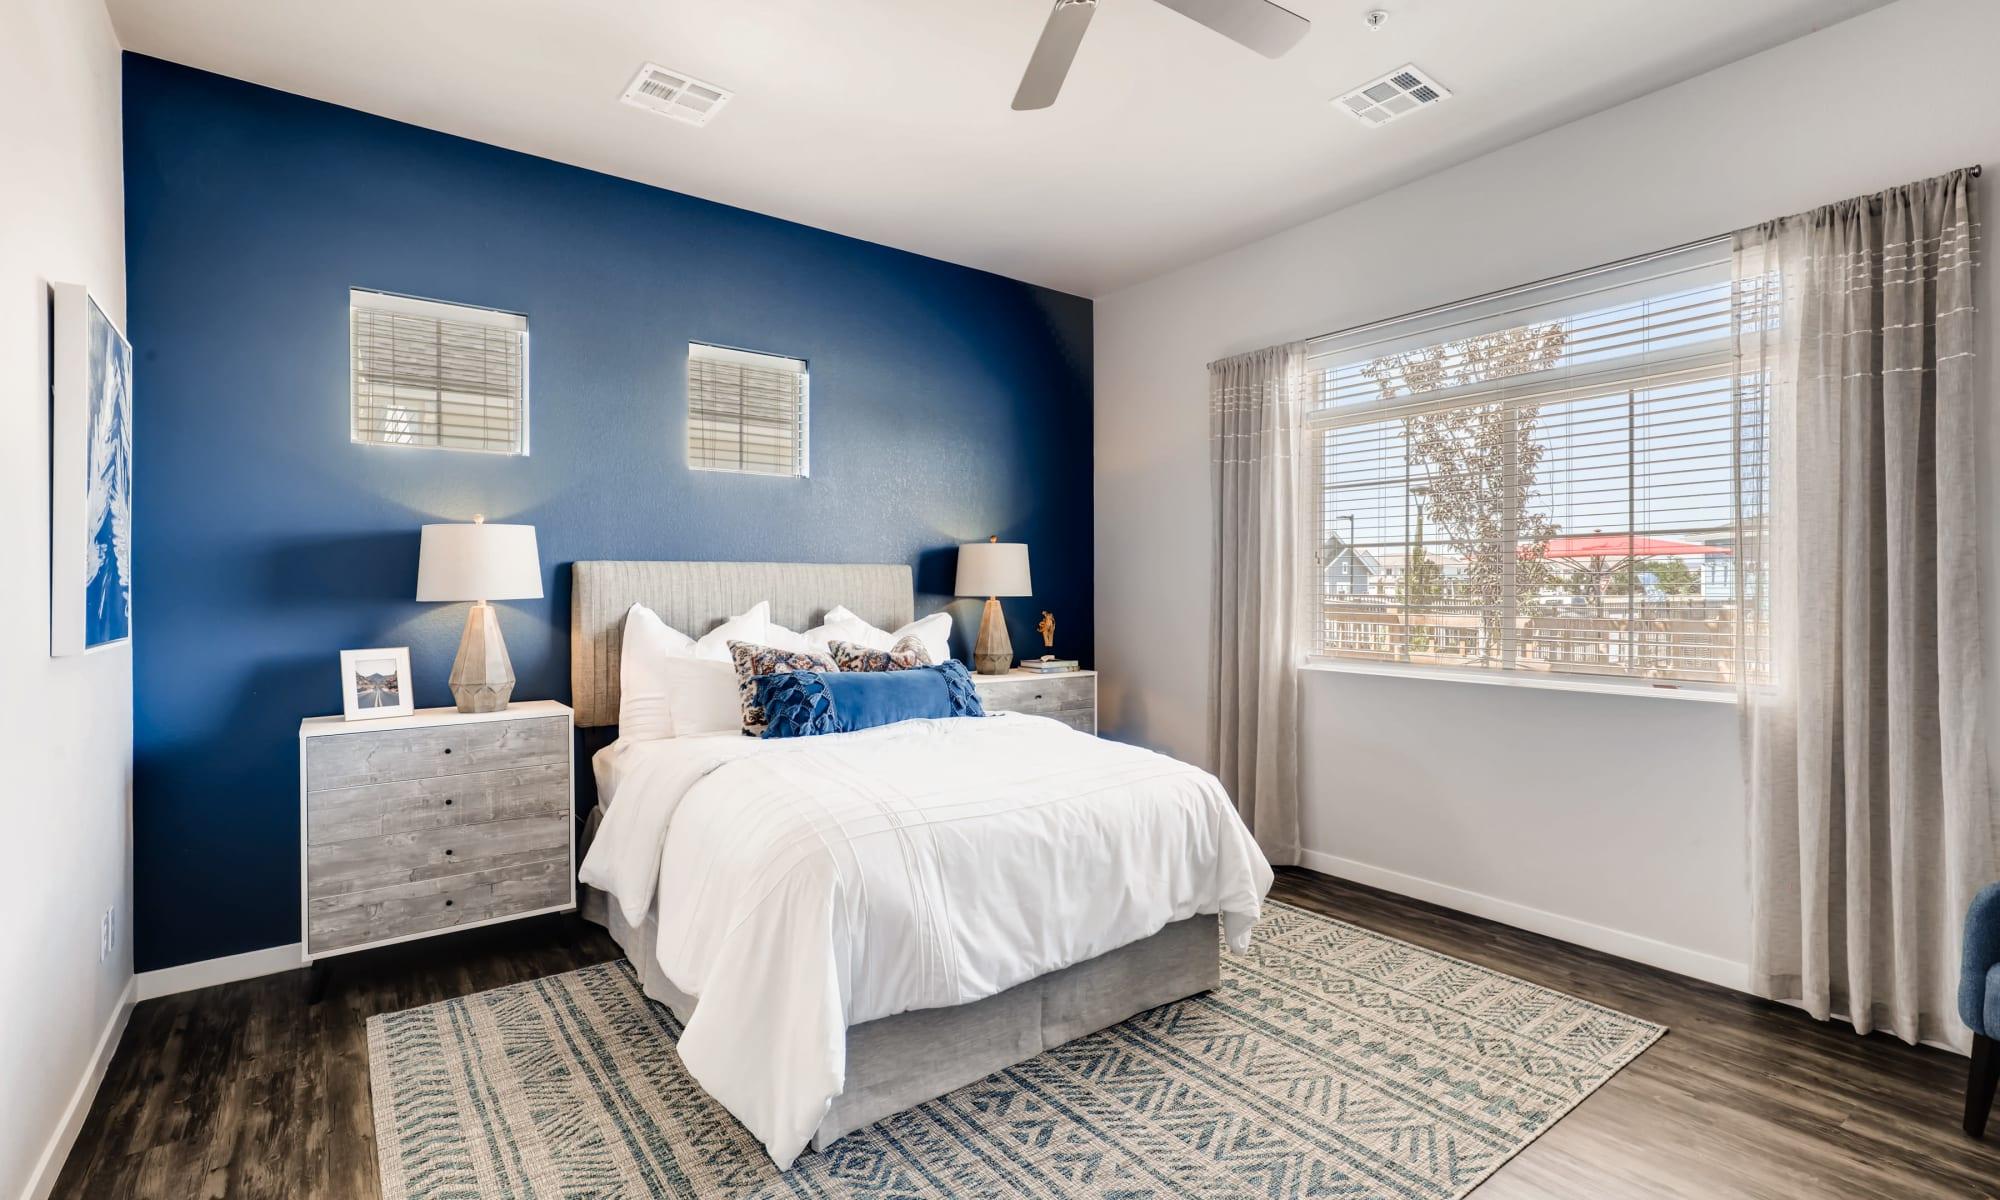 Avilla Eastlake apartment homes in Thornton, Colorado